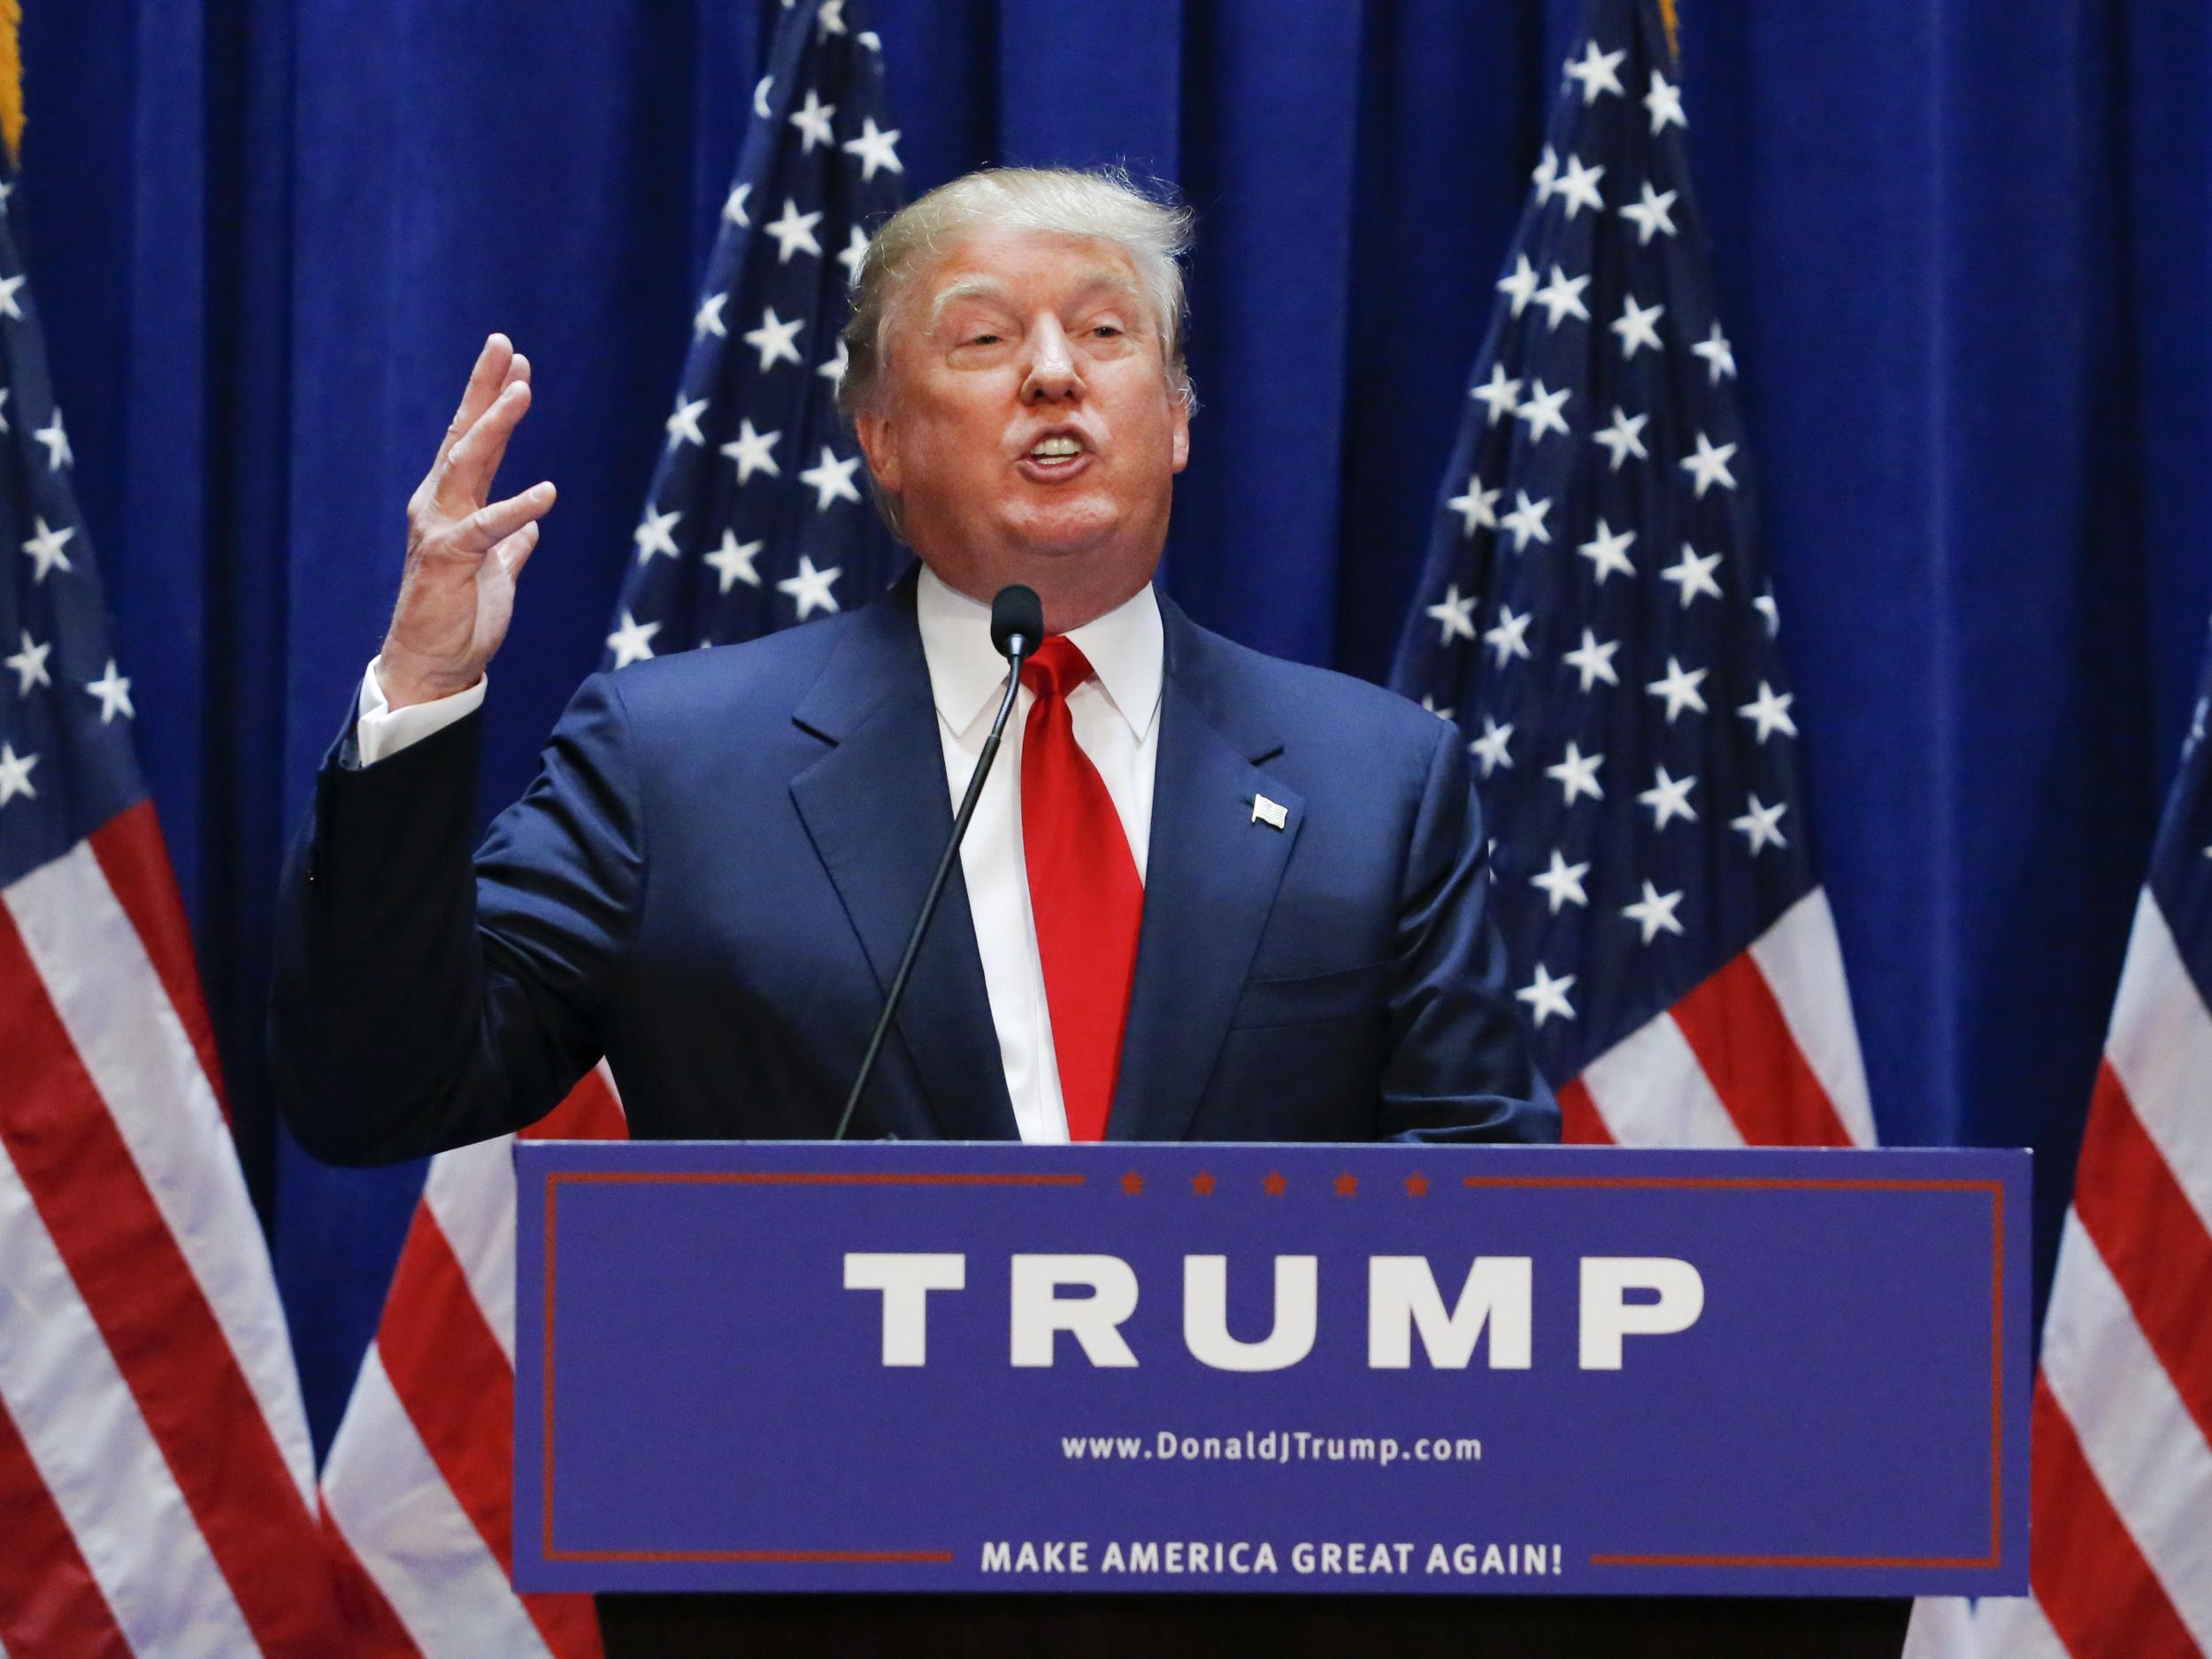 Worked Order Best Essay On Donald Trump senator